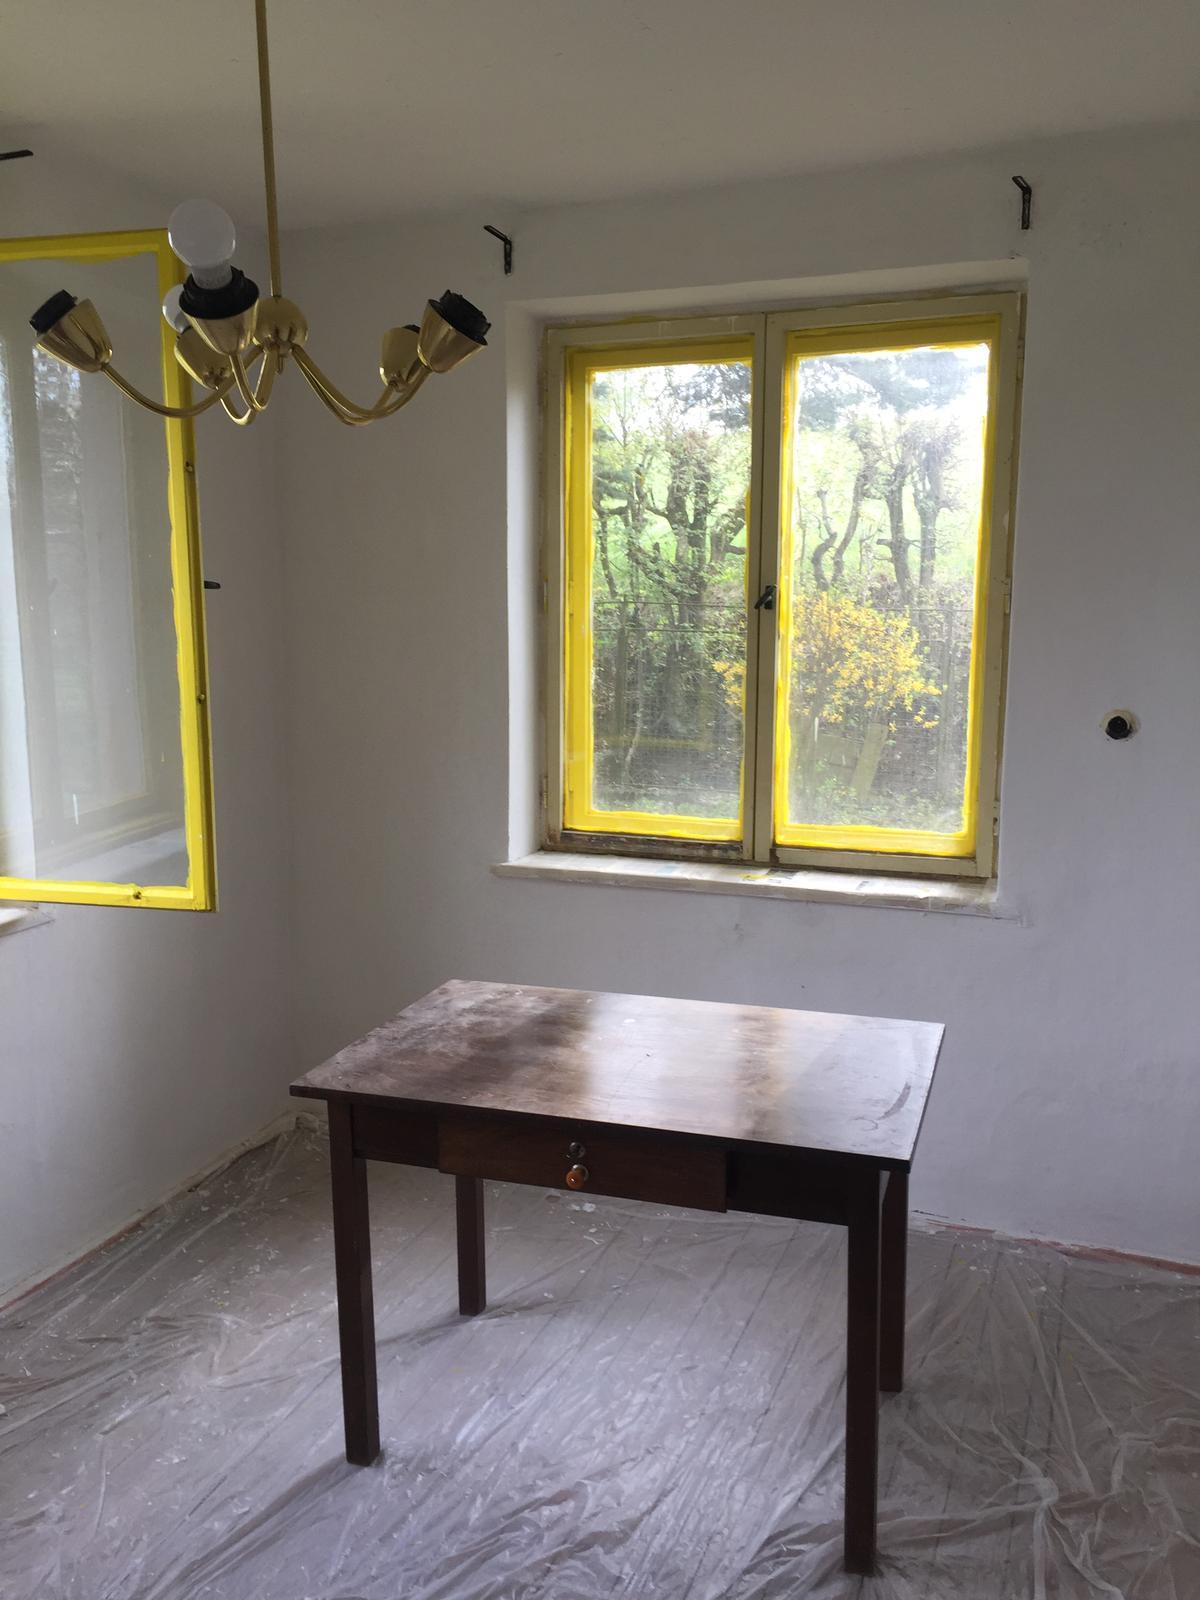 Dom - ...aj ked povodna farba okien bola ina, zlta zvonku im celkom pristane ;)